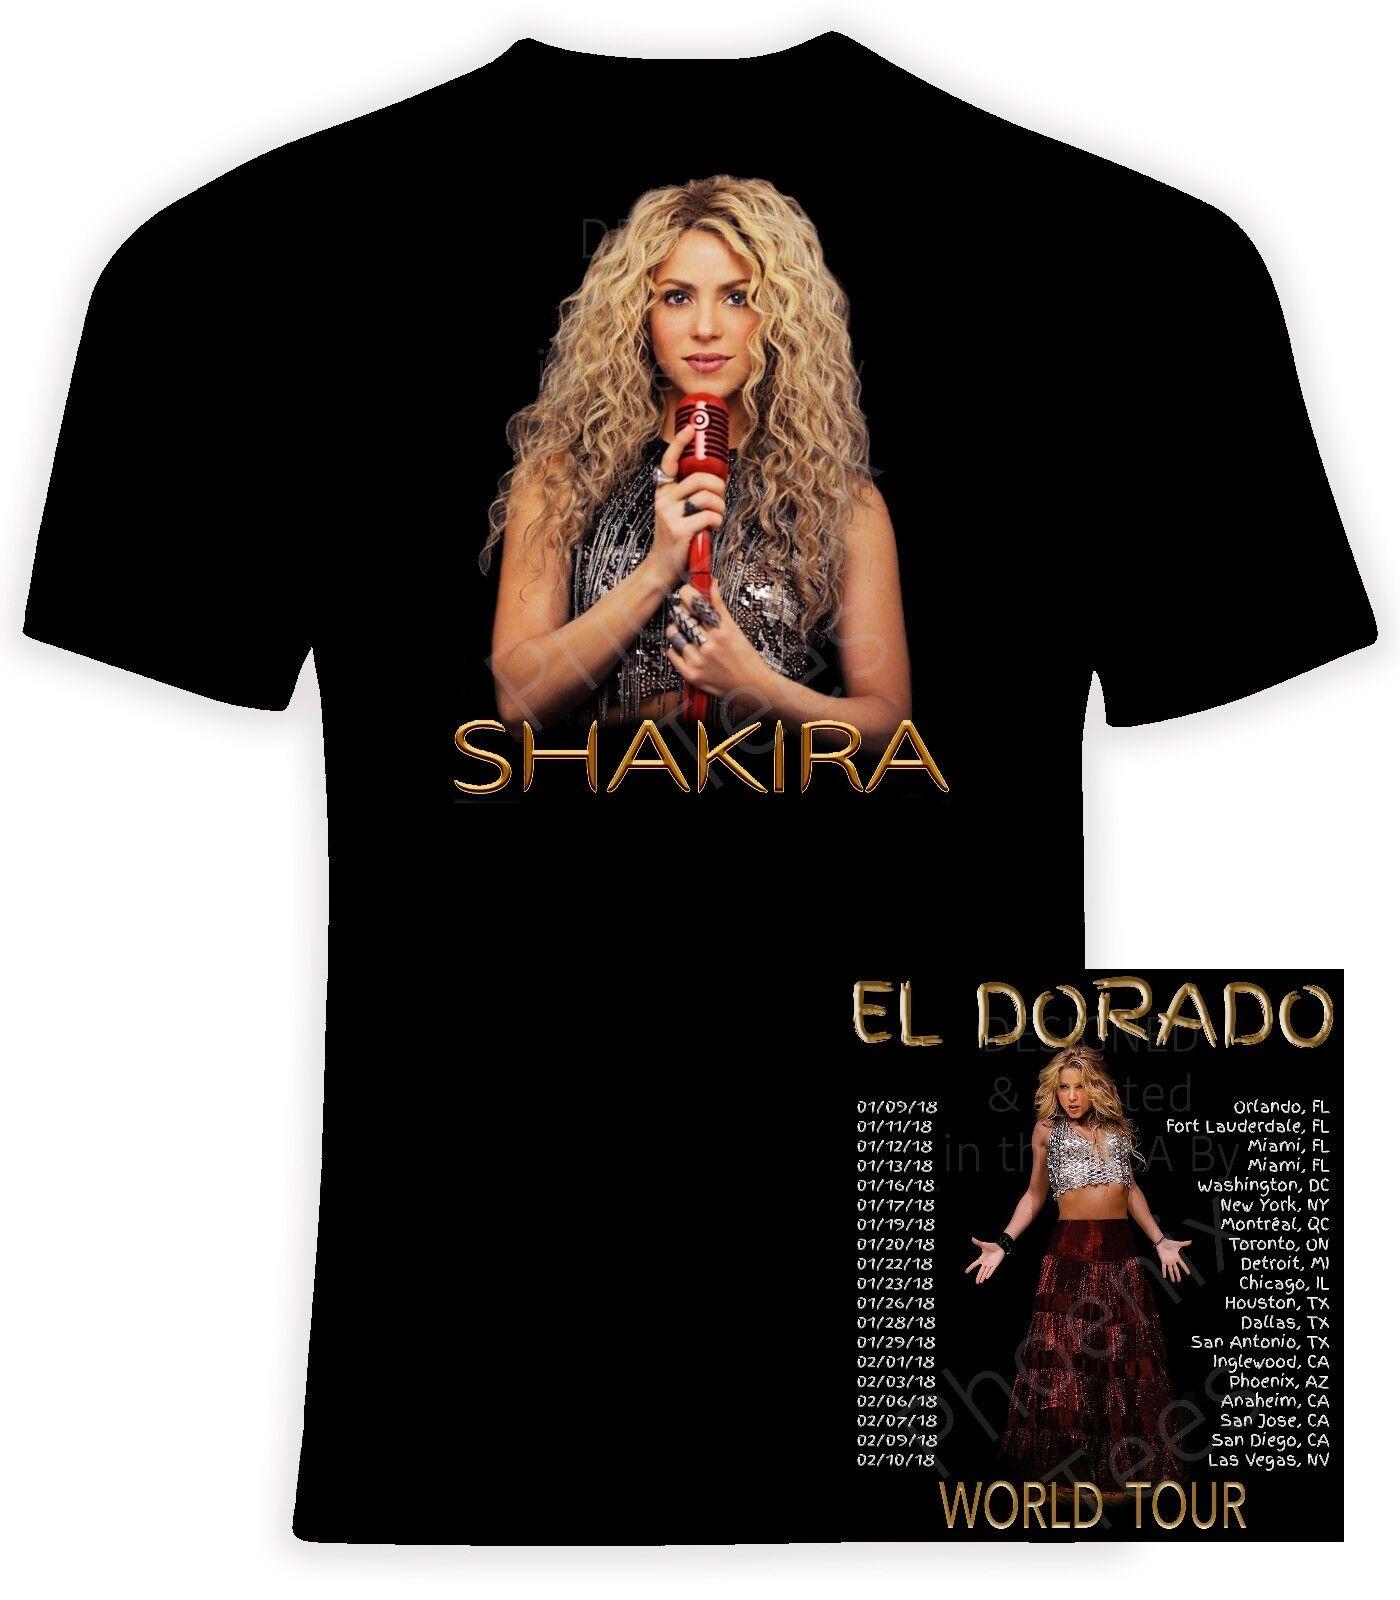 Shakira 2018 El Dorado World Tour Unisex T shirt, Größes S-6X